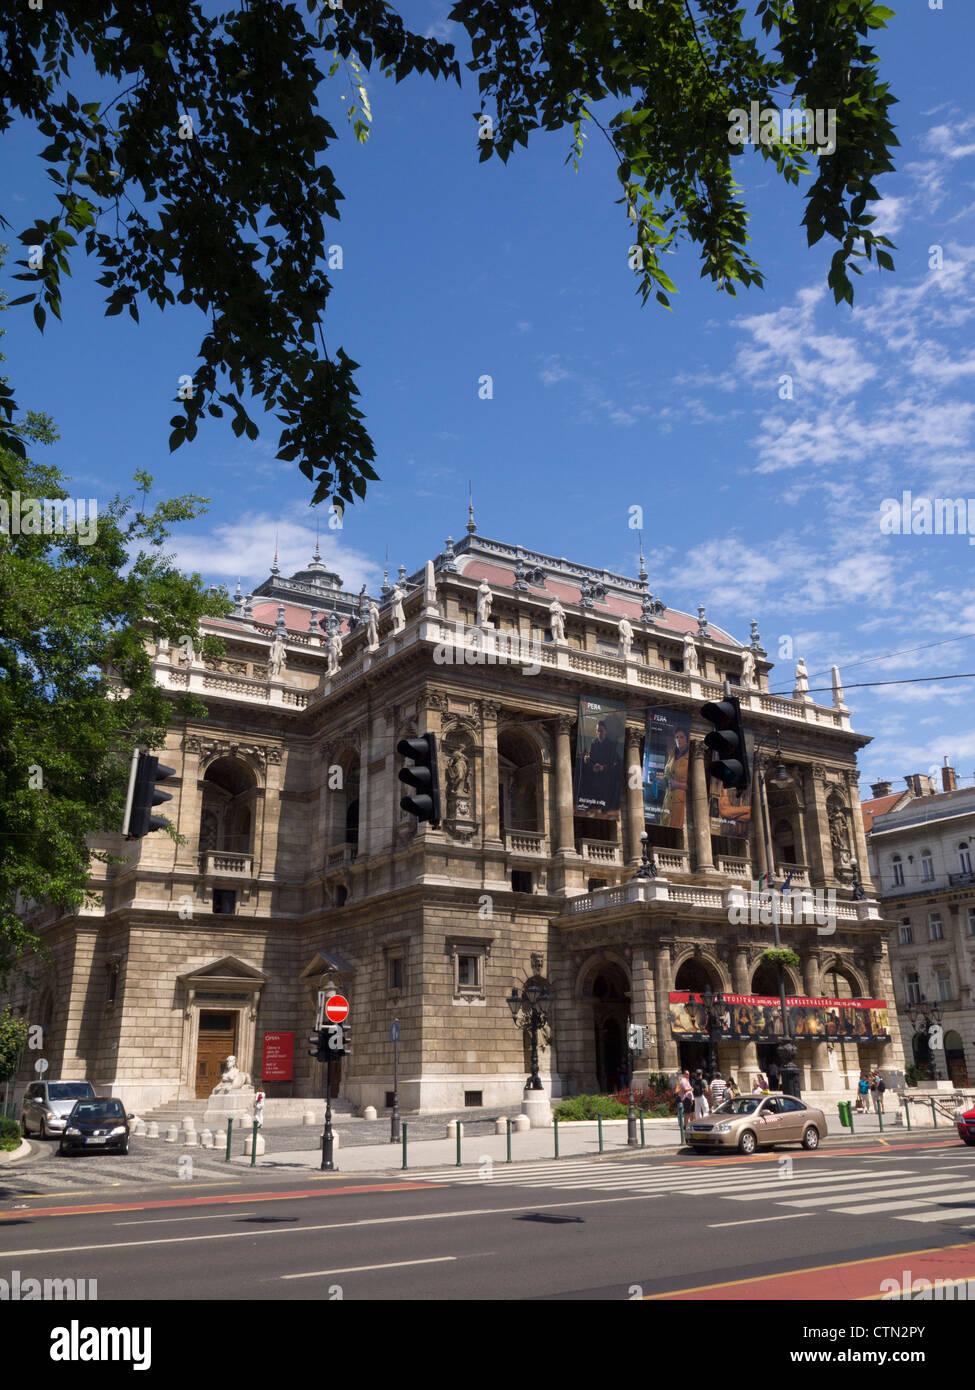 Hungarian State Opera House (Állami Operaház) exterior, Budapest, Hungary, Eastern Europe - Stock Image